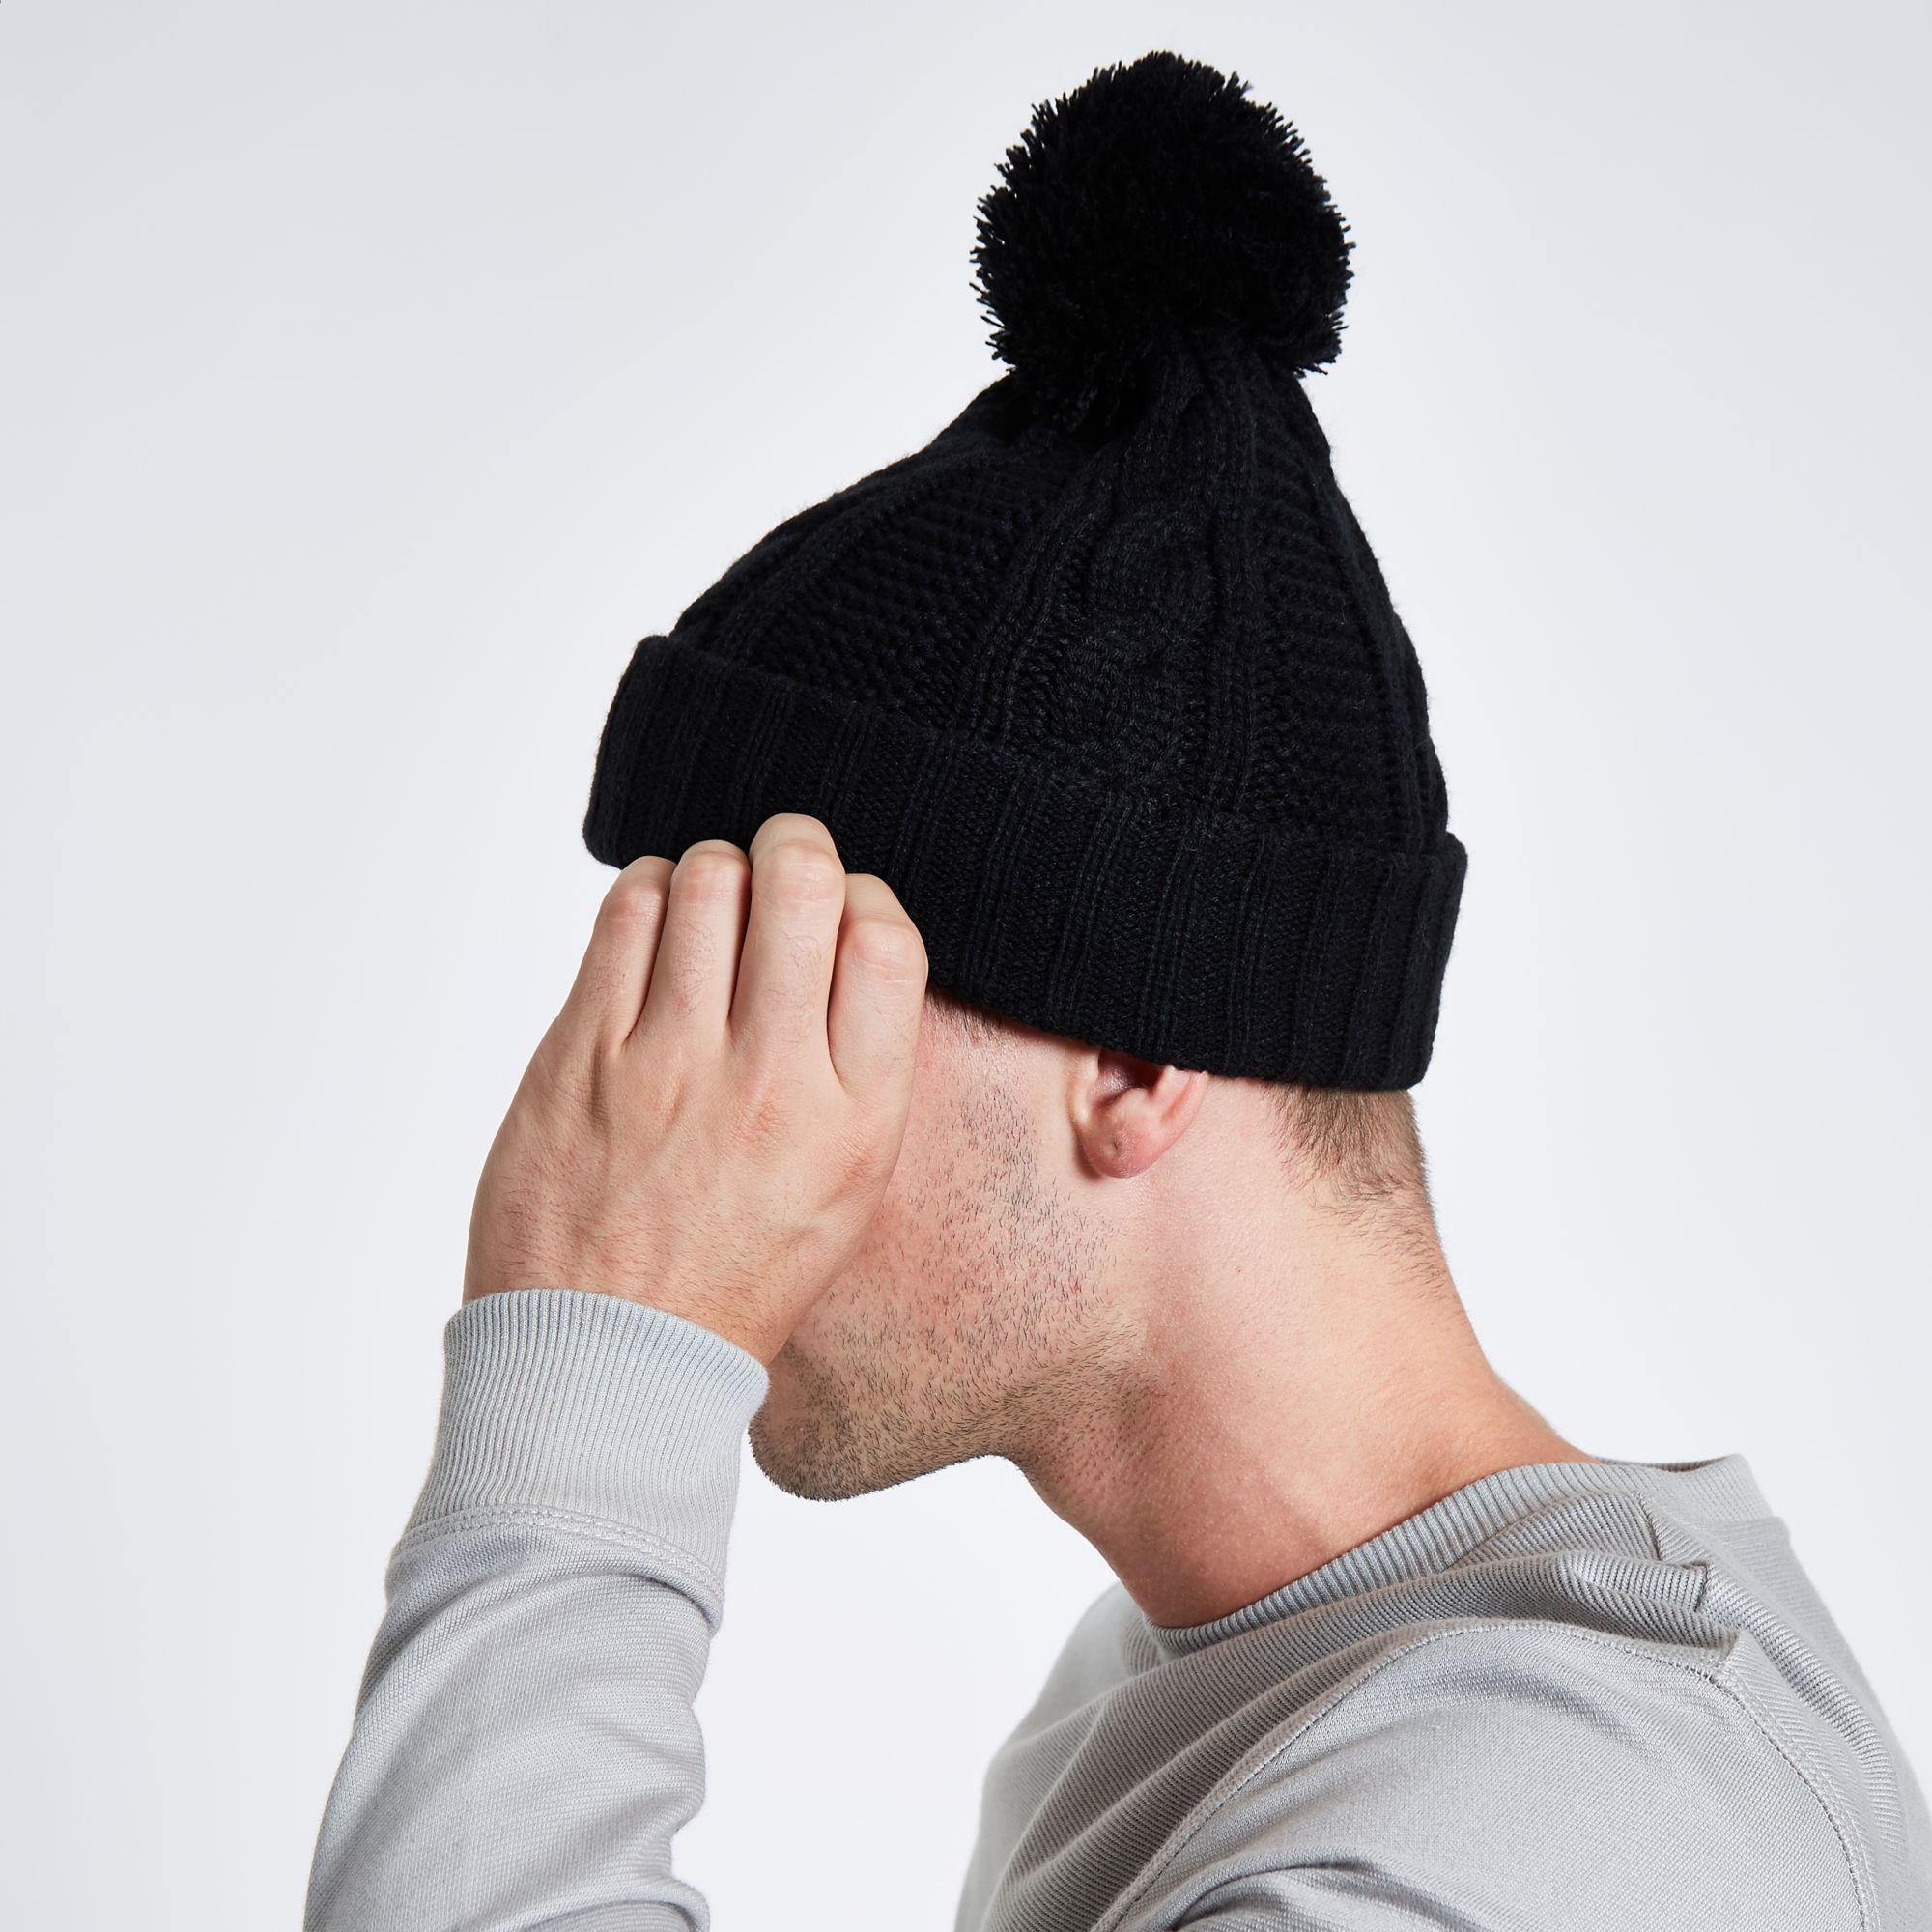 42e20c1cef6 River Island - Black Cable Knit Bobble Beanie Hat for Men - Lyst. View  fullscreen